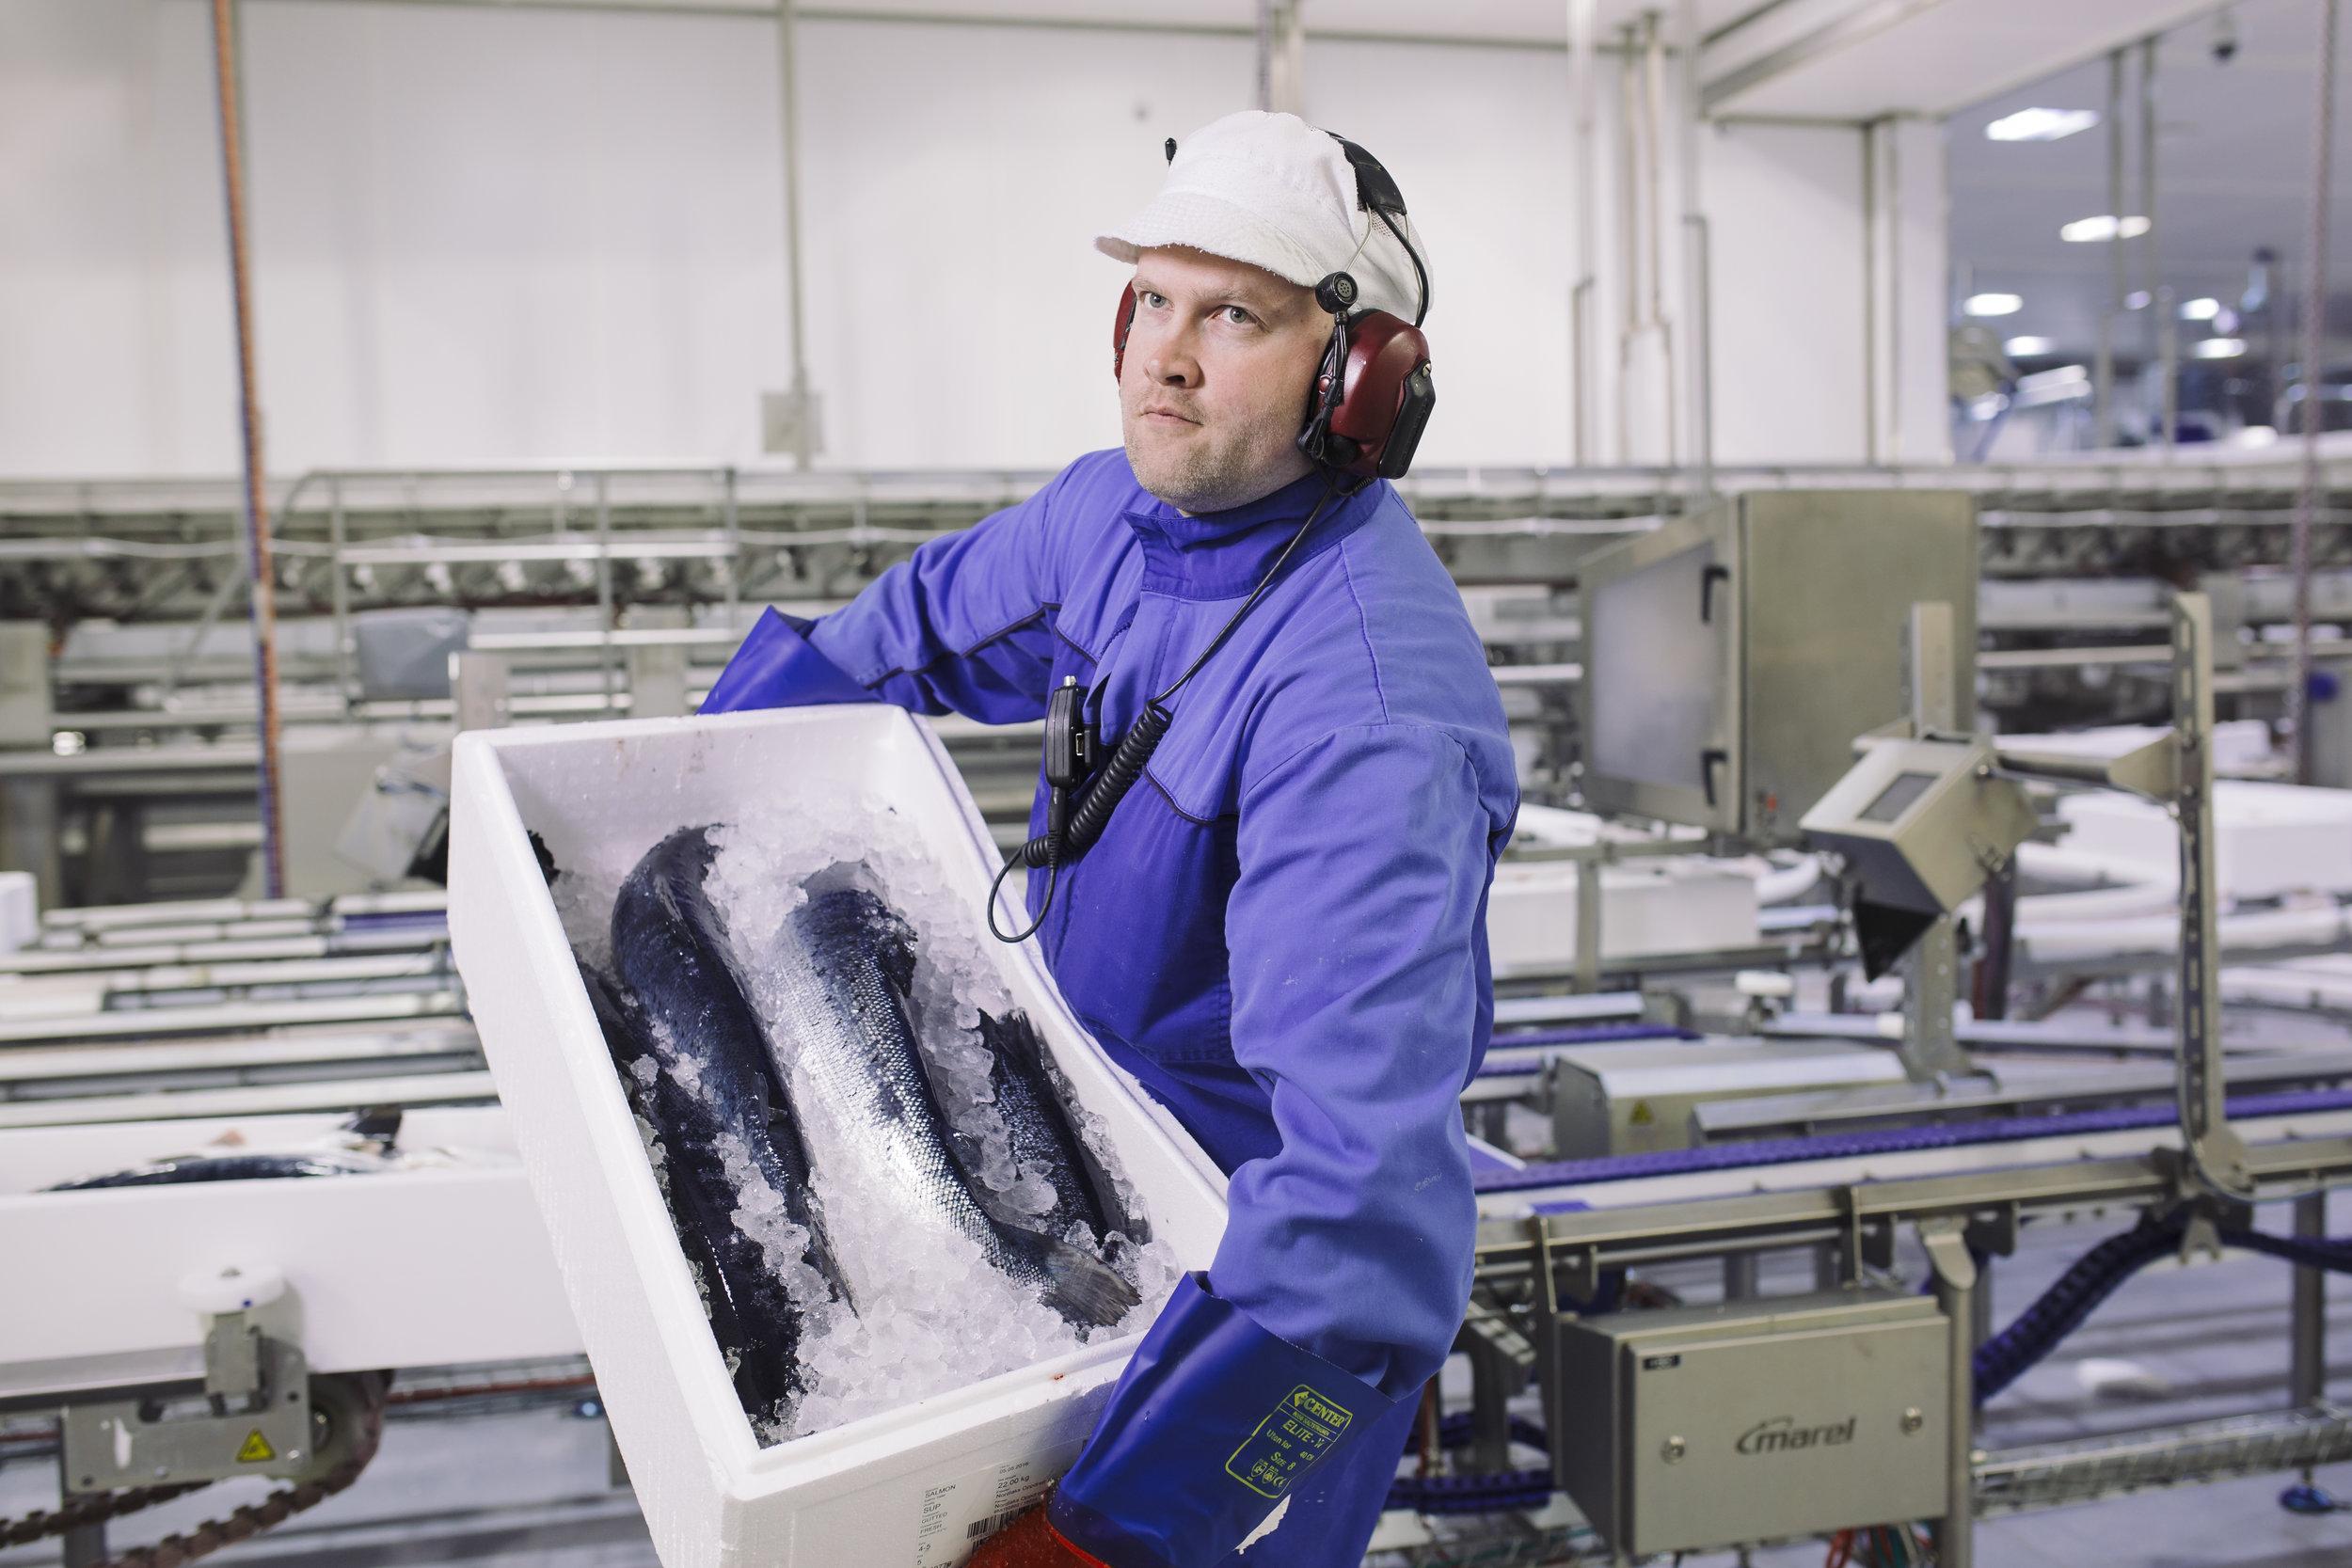 Packing of fresh HOG salmon at Nordlaks Produkter. Photo: Marius Fiskum